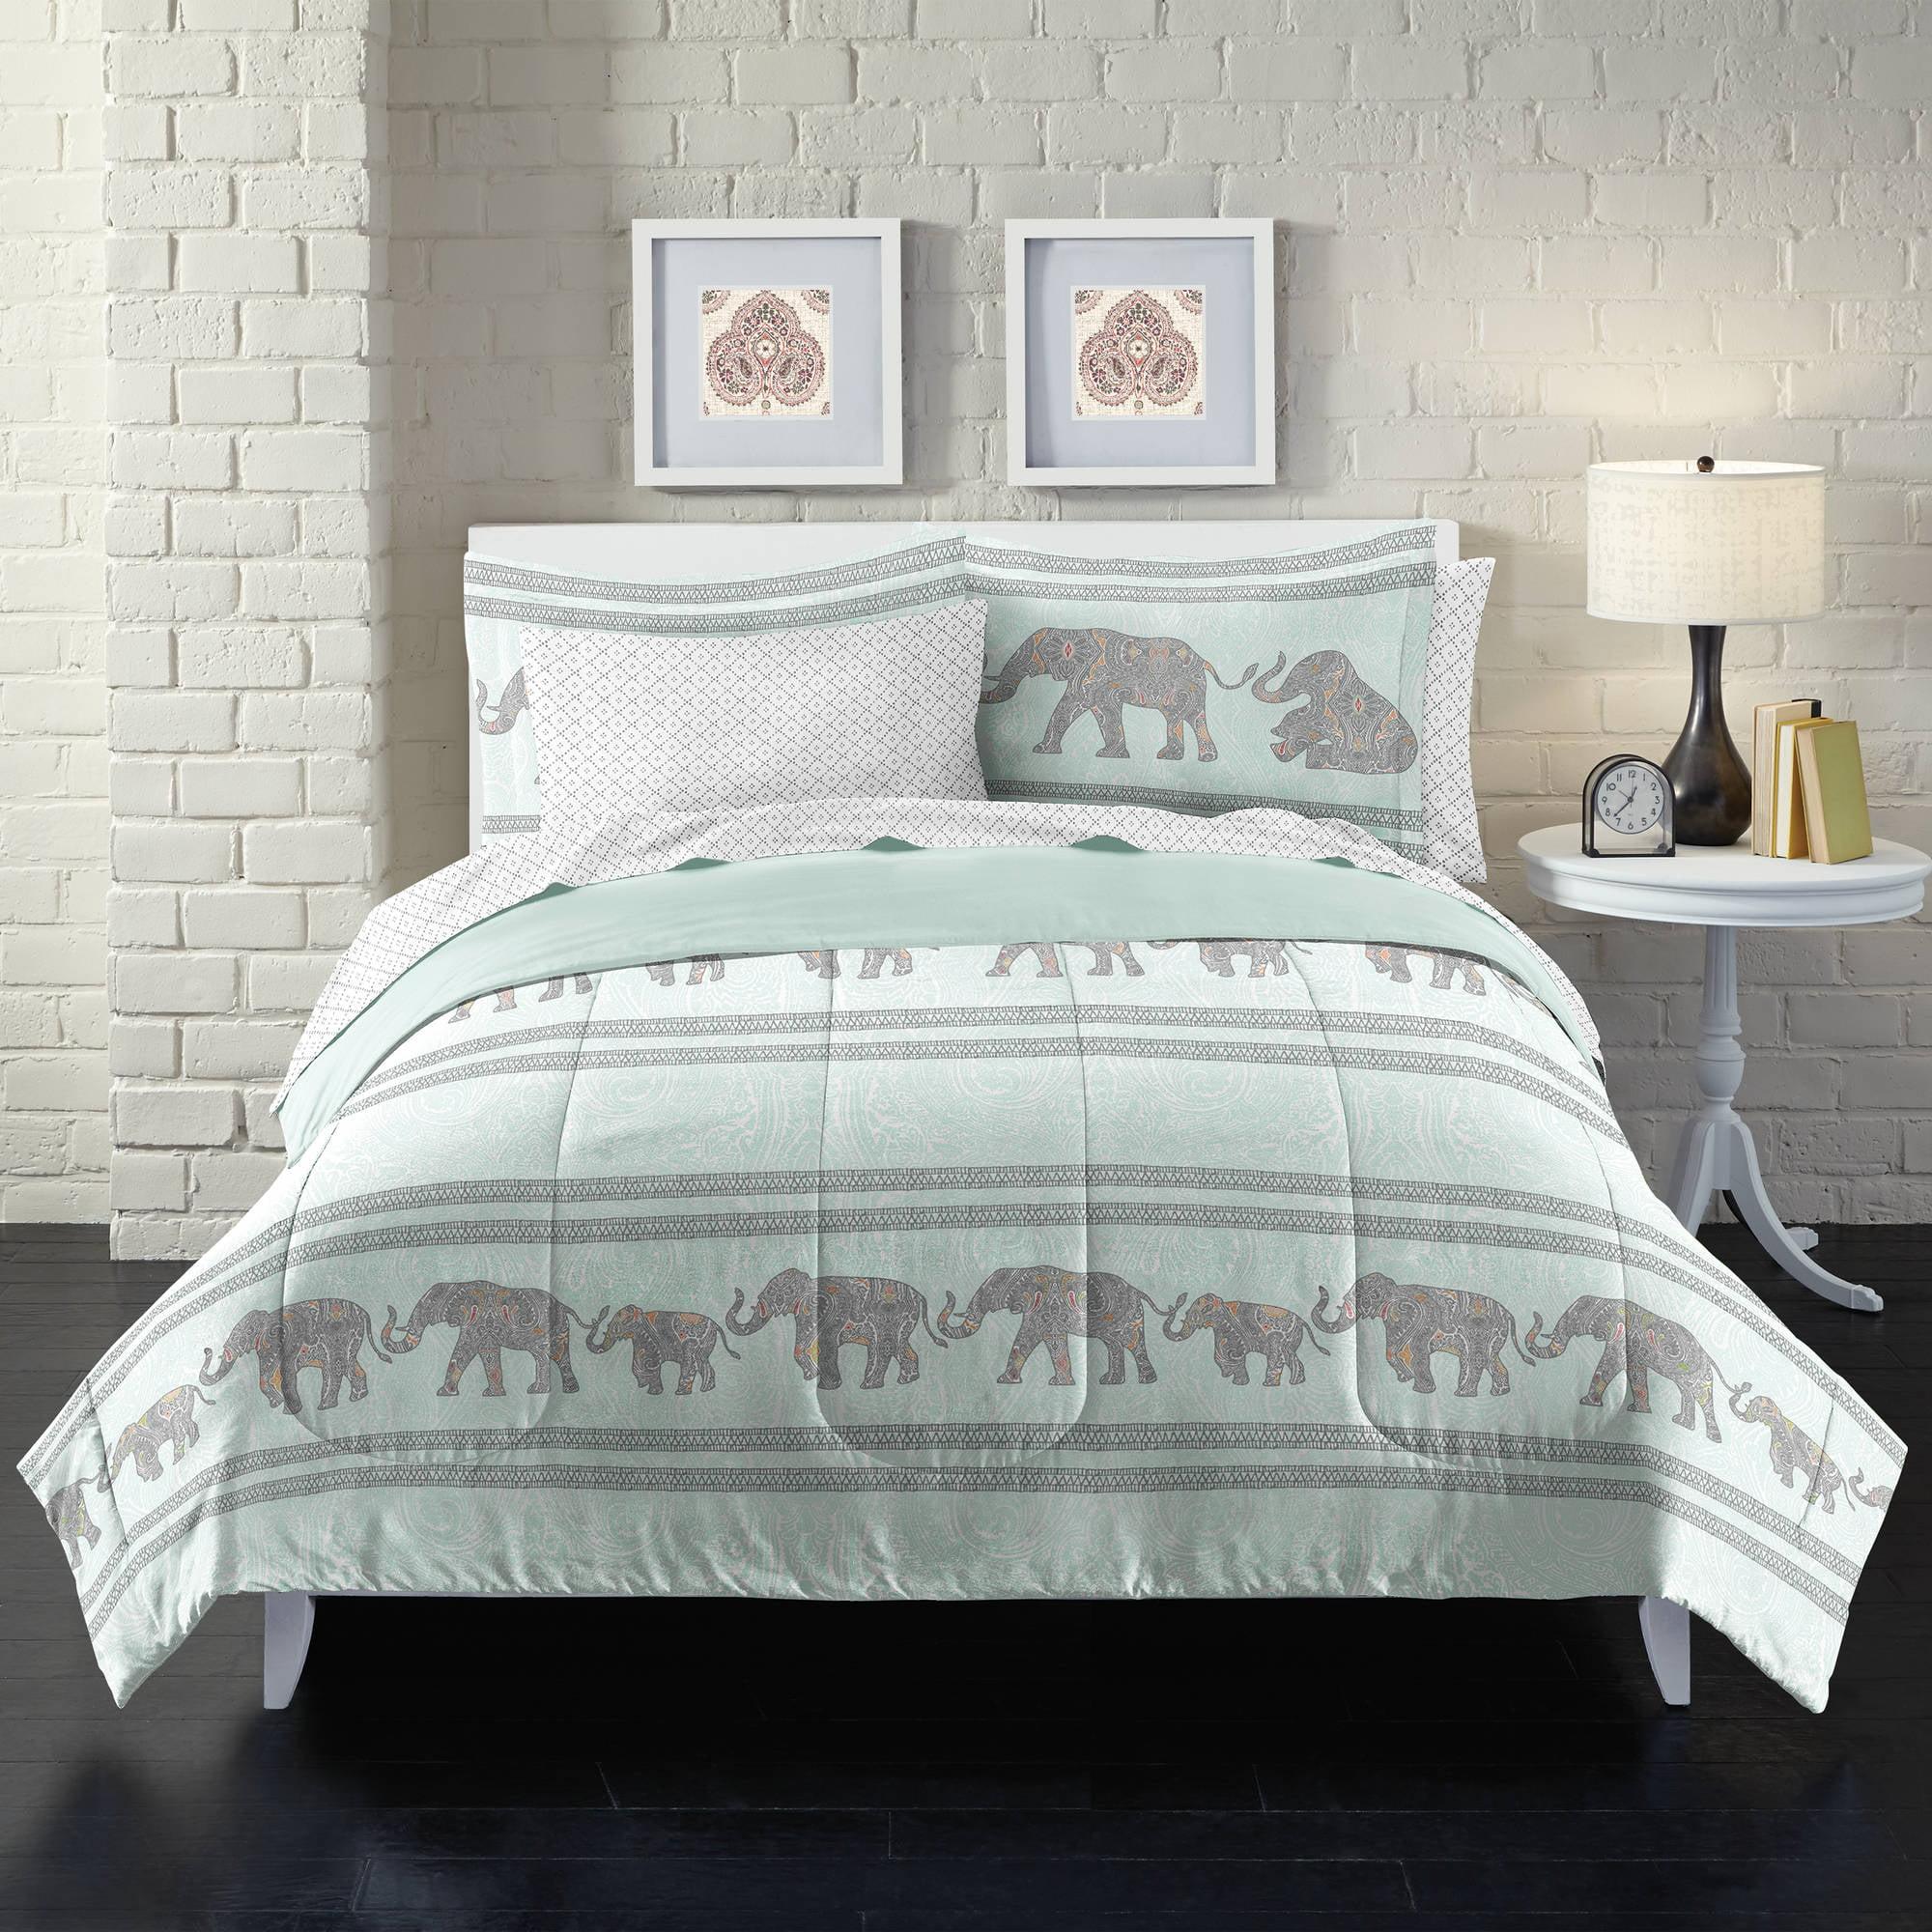 Loft Style Boho Elephant Bed In A Bag Comforter Set,Blue